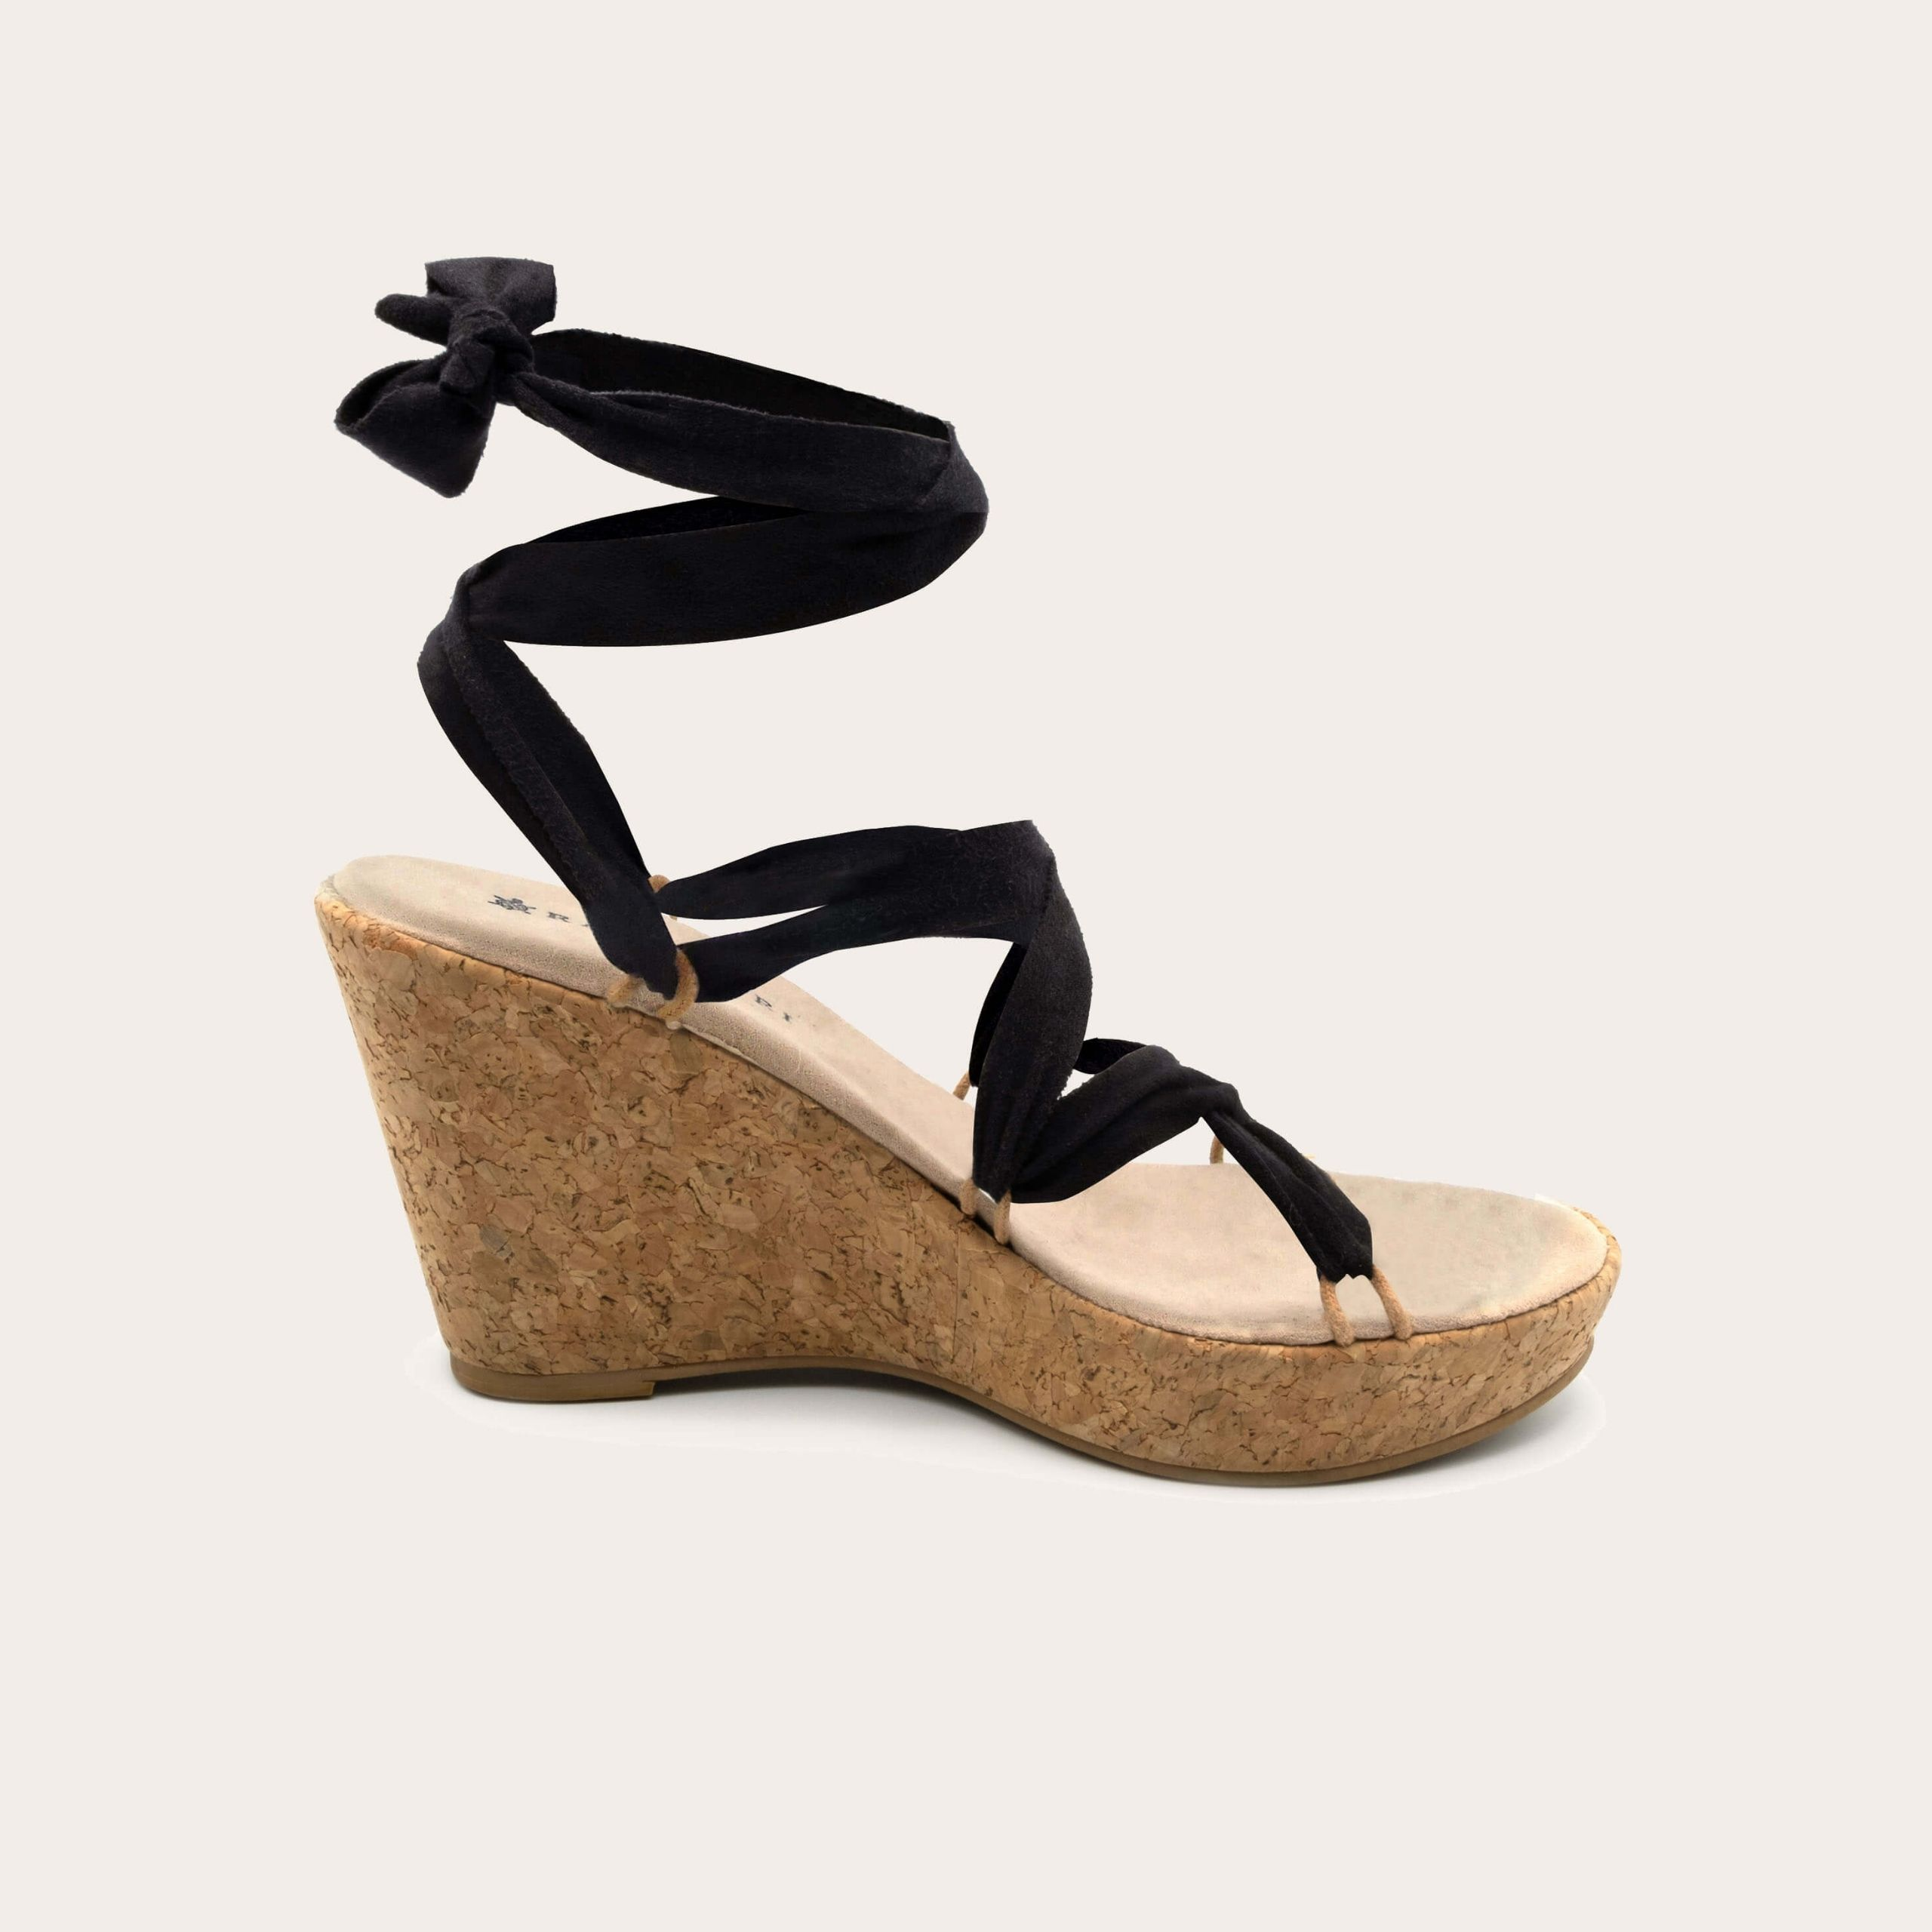 chilon-cork-1_lintsandalen sandals travelsandals vegan sustainable sandals wikkelsandalen